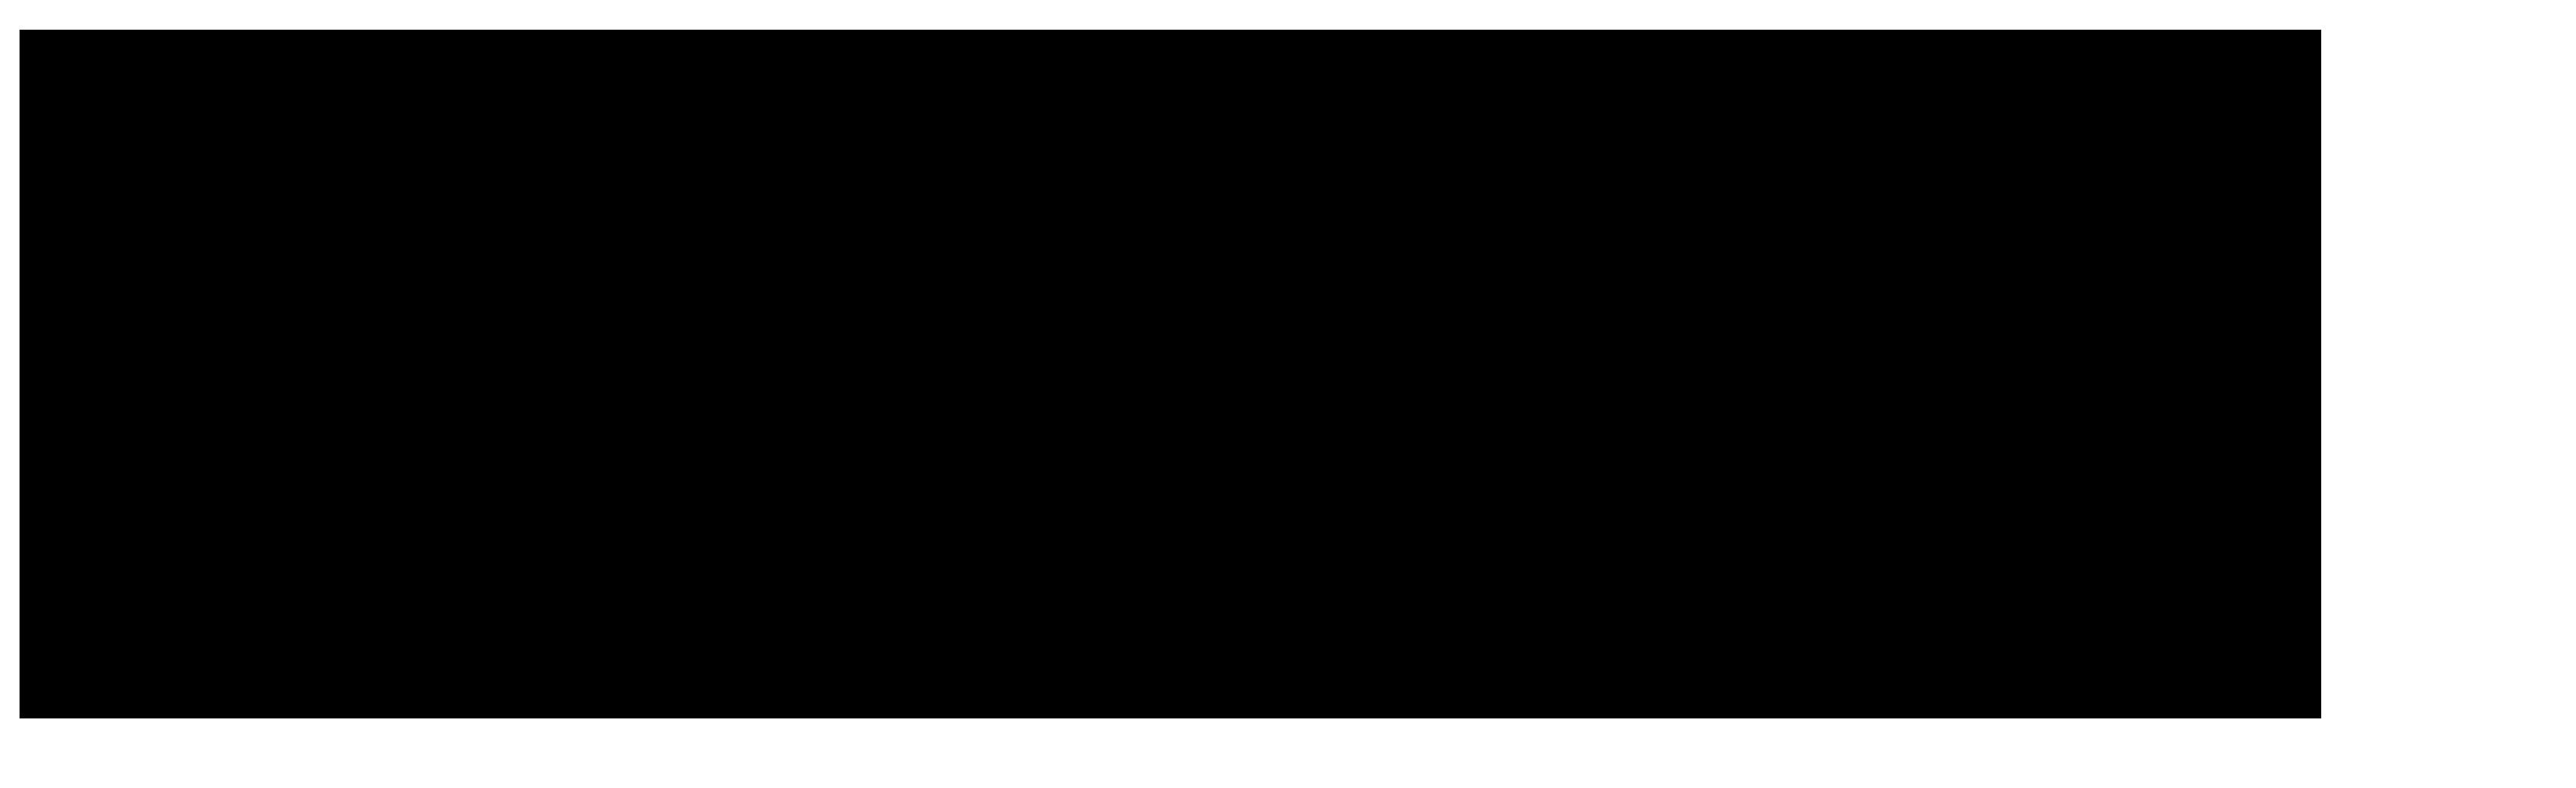 logo-Public Figures